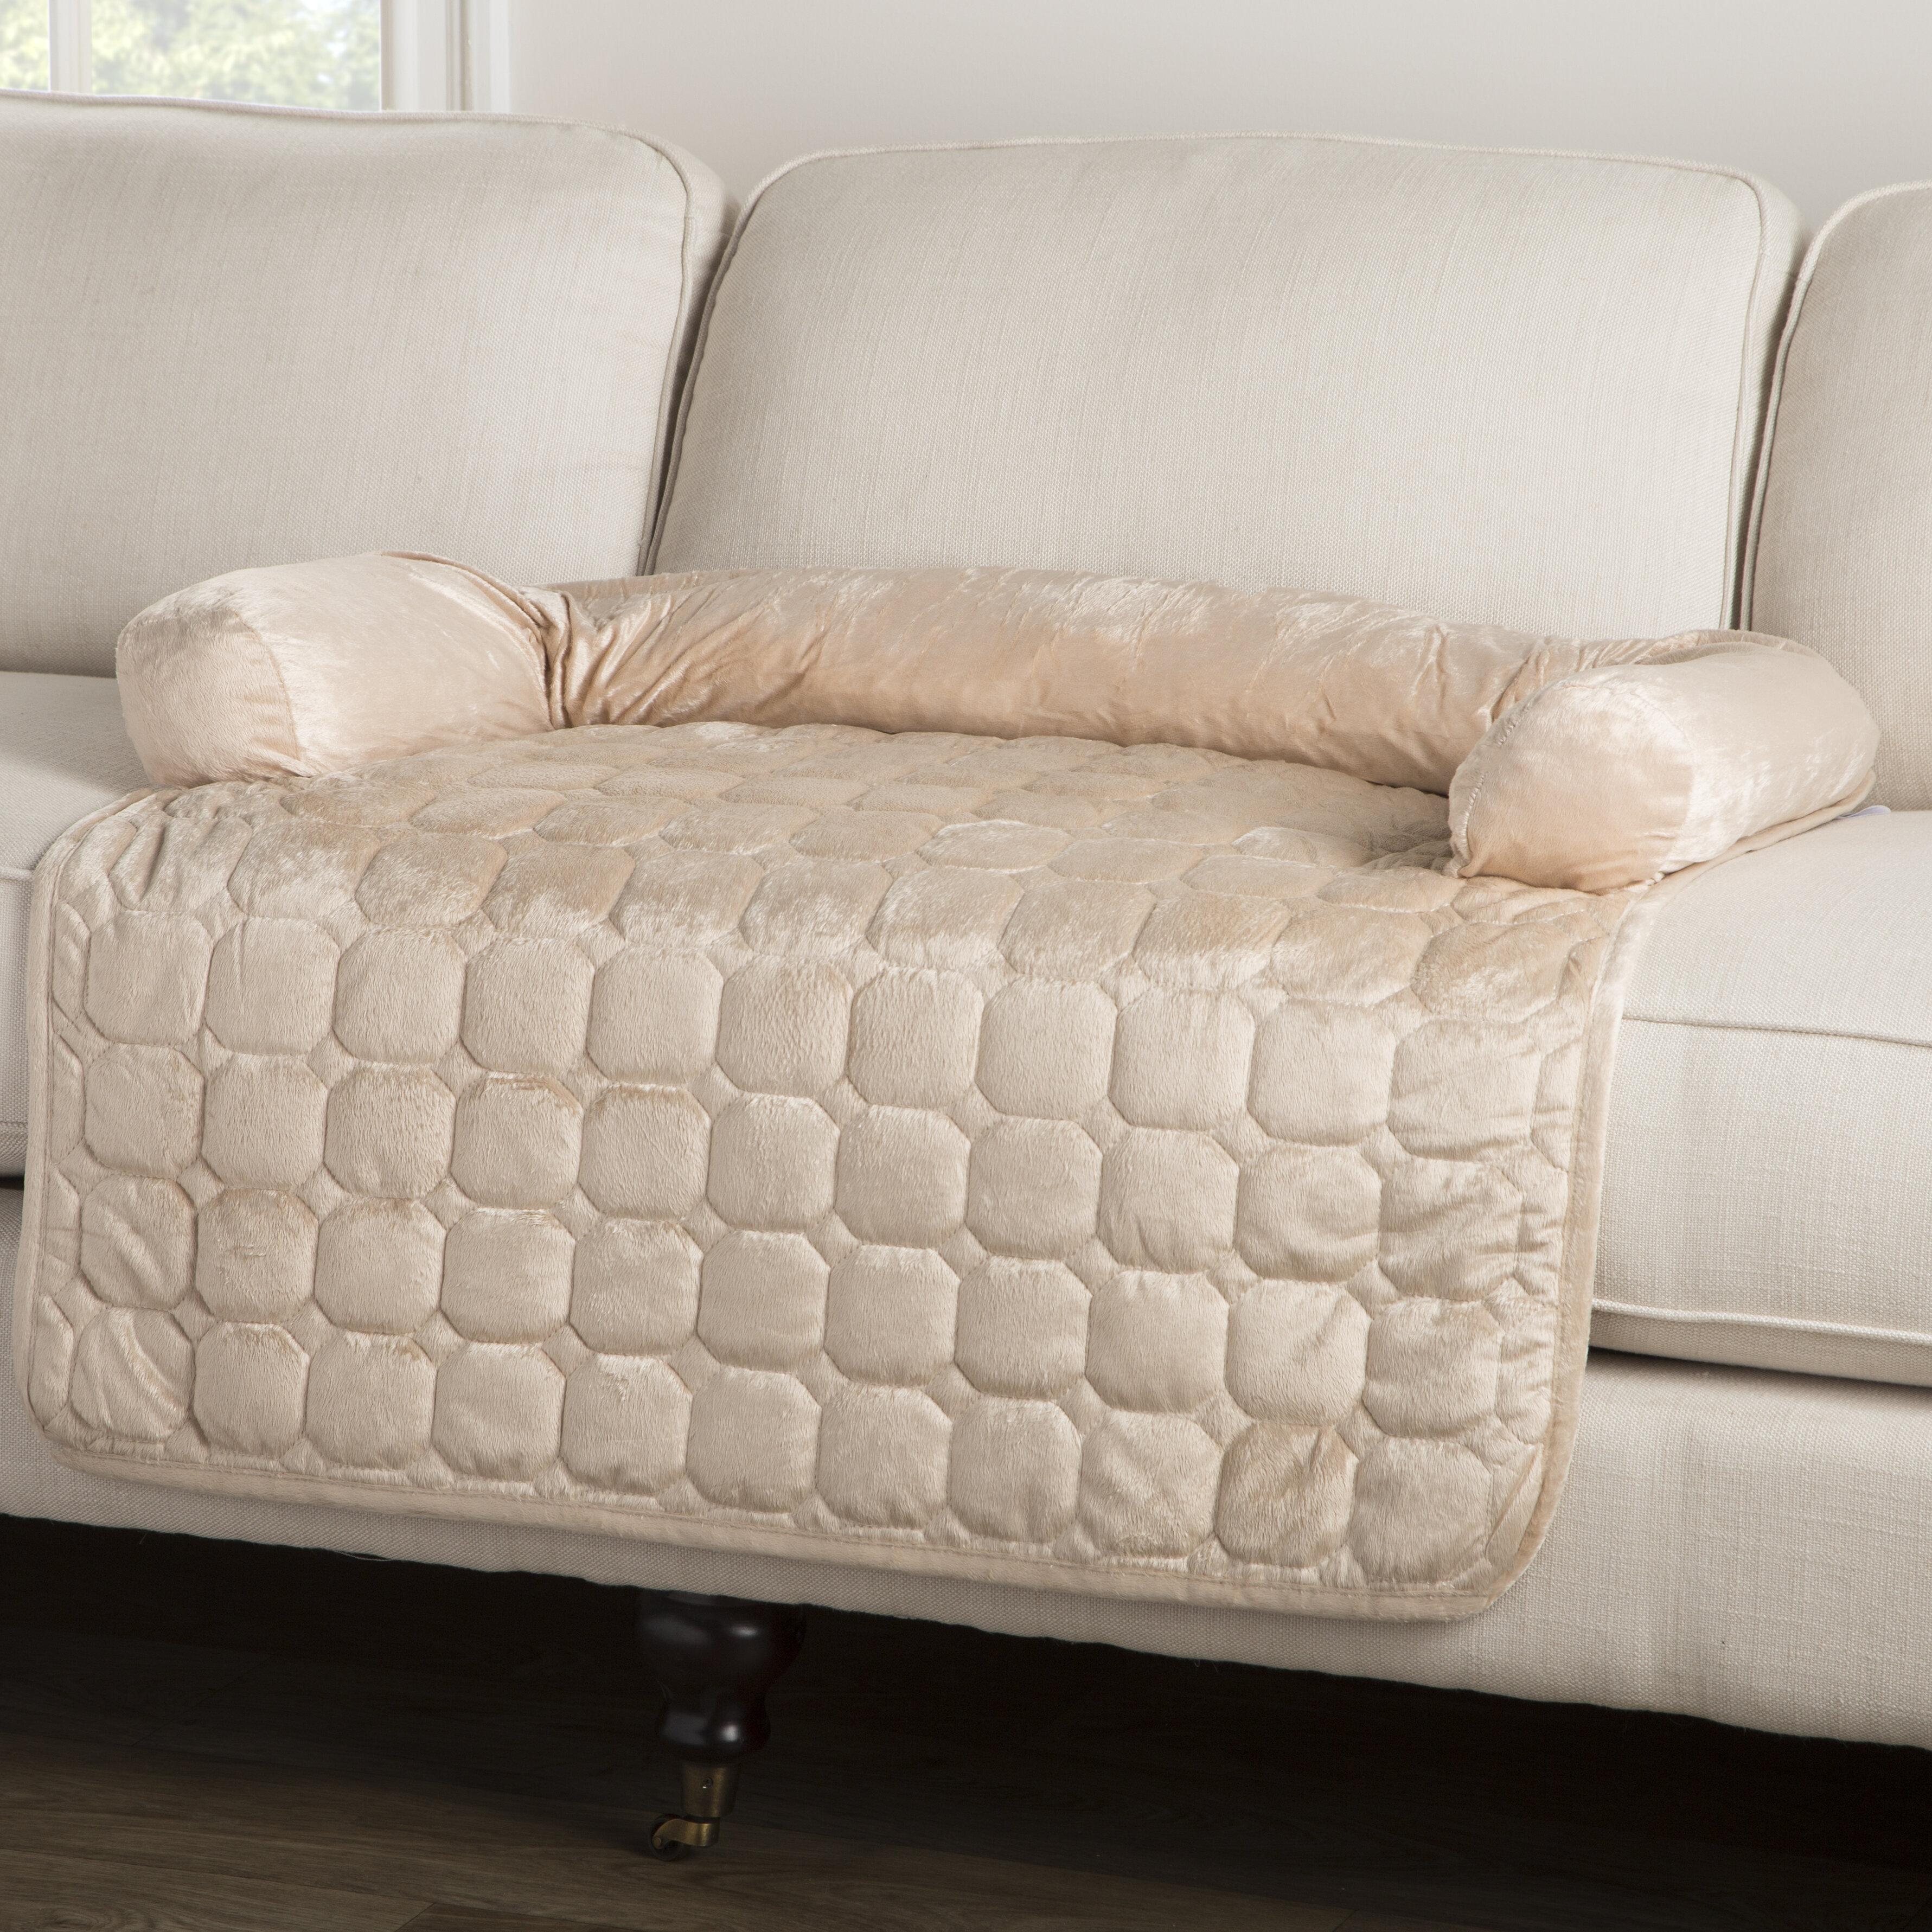 Delilah Furniture Protector Bolster